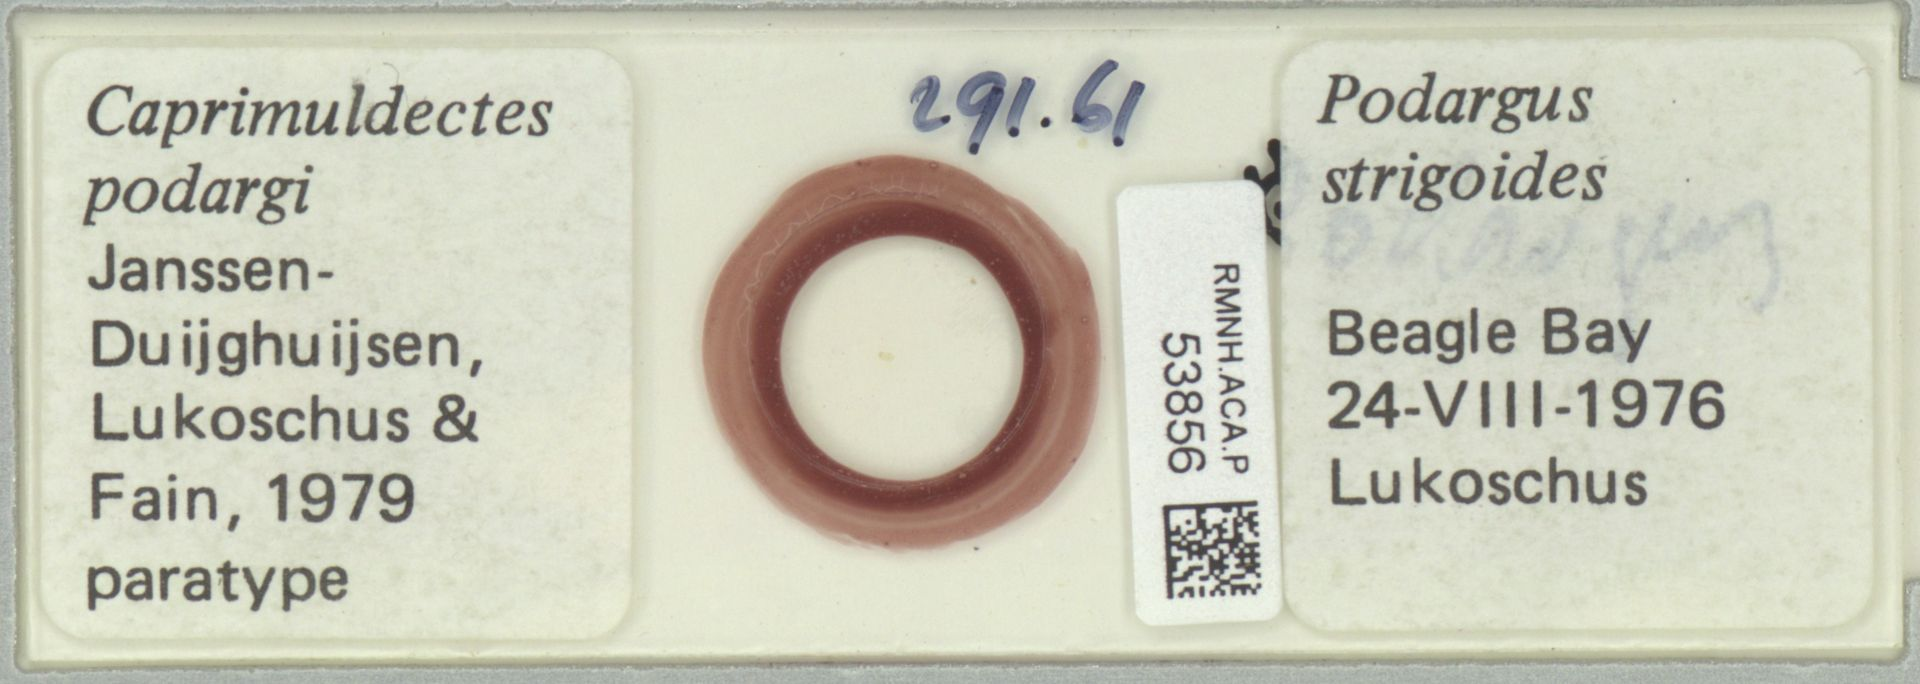 RMNH.ACA.P.53856 | Caprimuldectes podargi Janssen-Duijghuijsen, Lukoschus & Fain, 1979